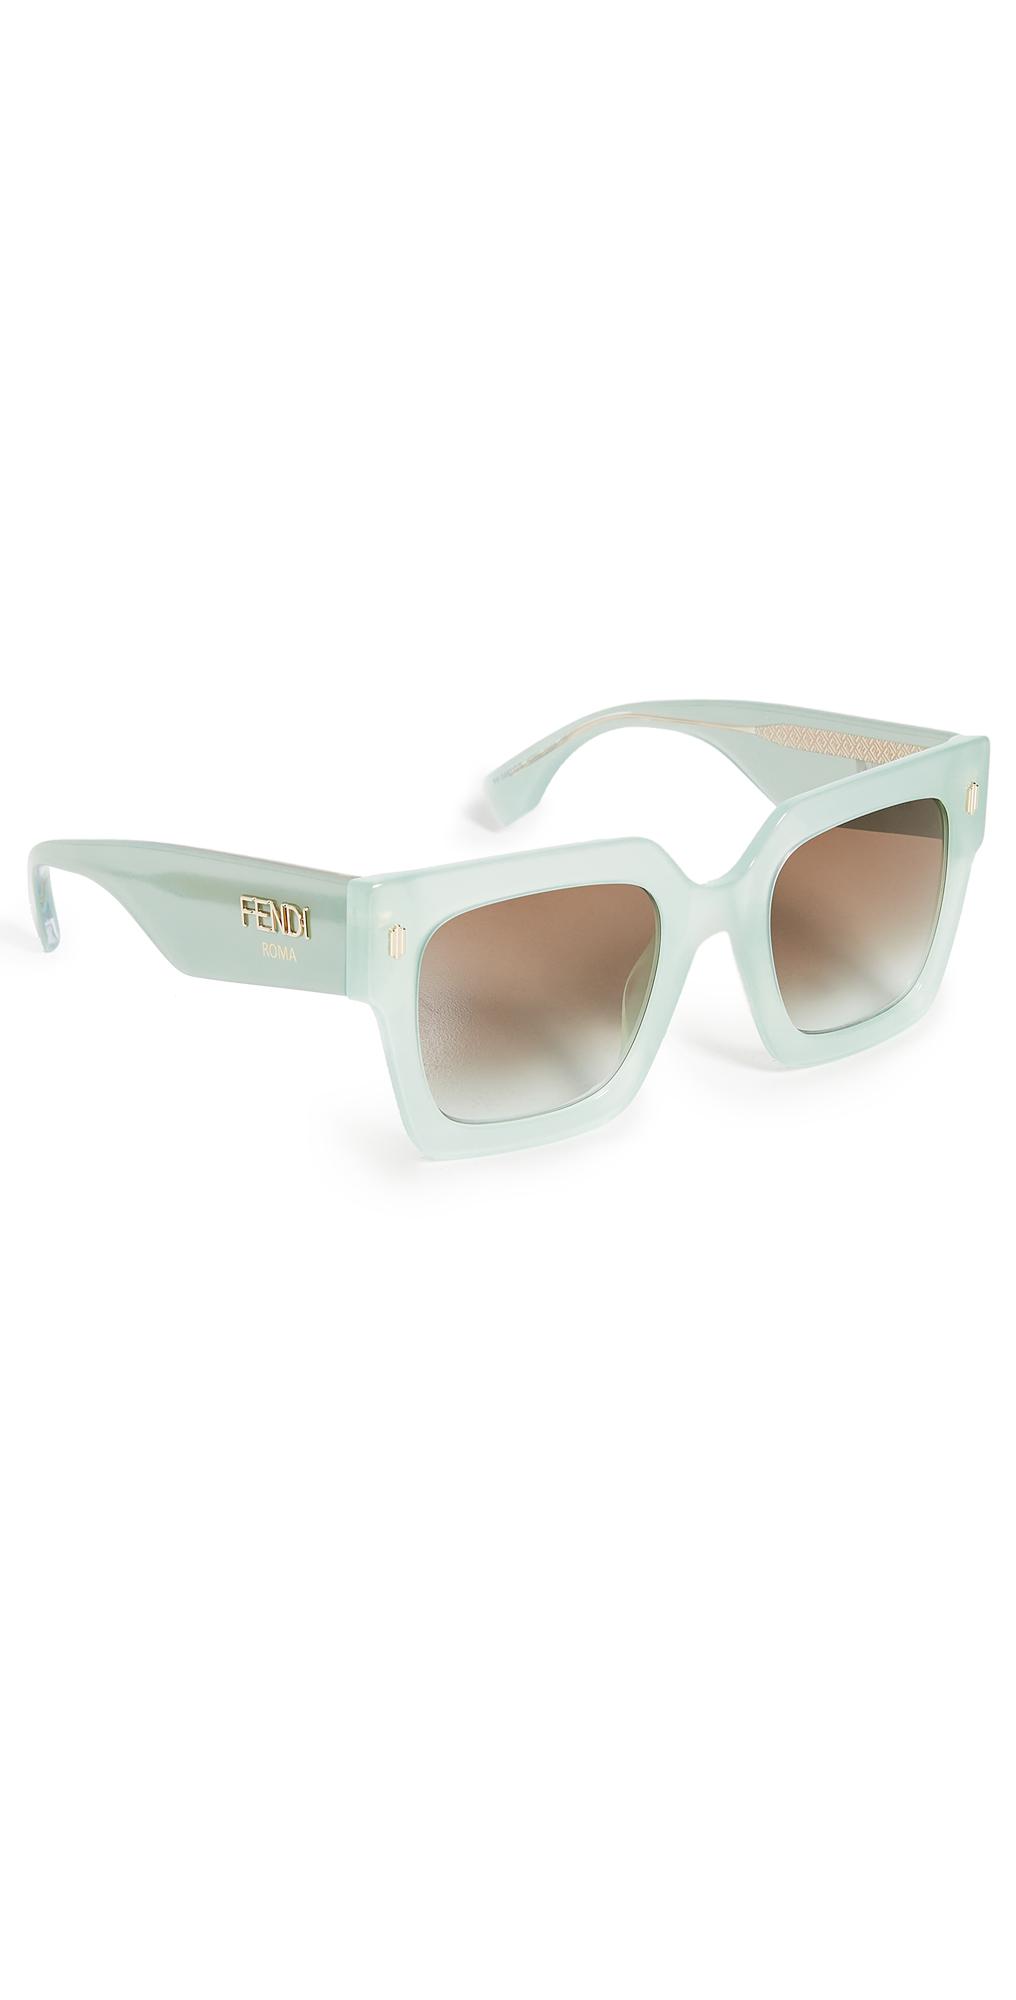 Fendi Classic Square Logo Sunglasses